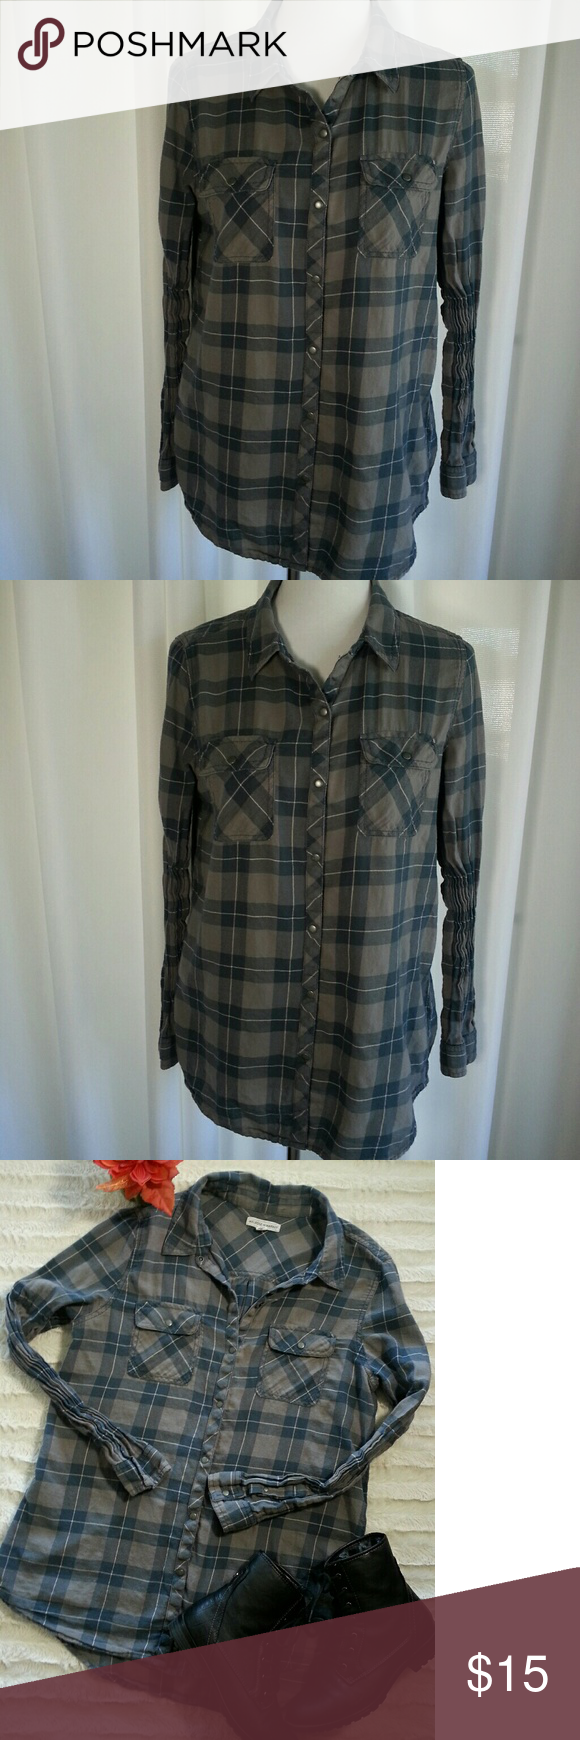 Flannel shirt black and grey  Melrose u Market Classic Flannel Size Medium  Flannel shirts